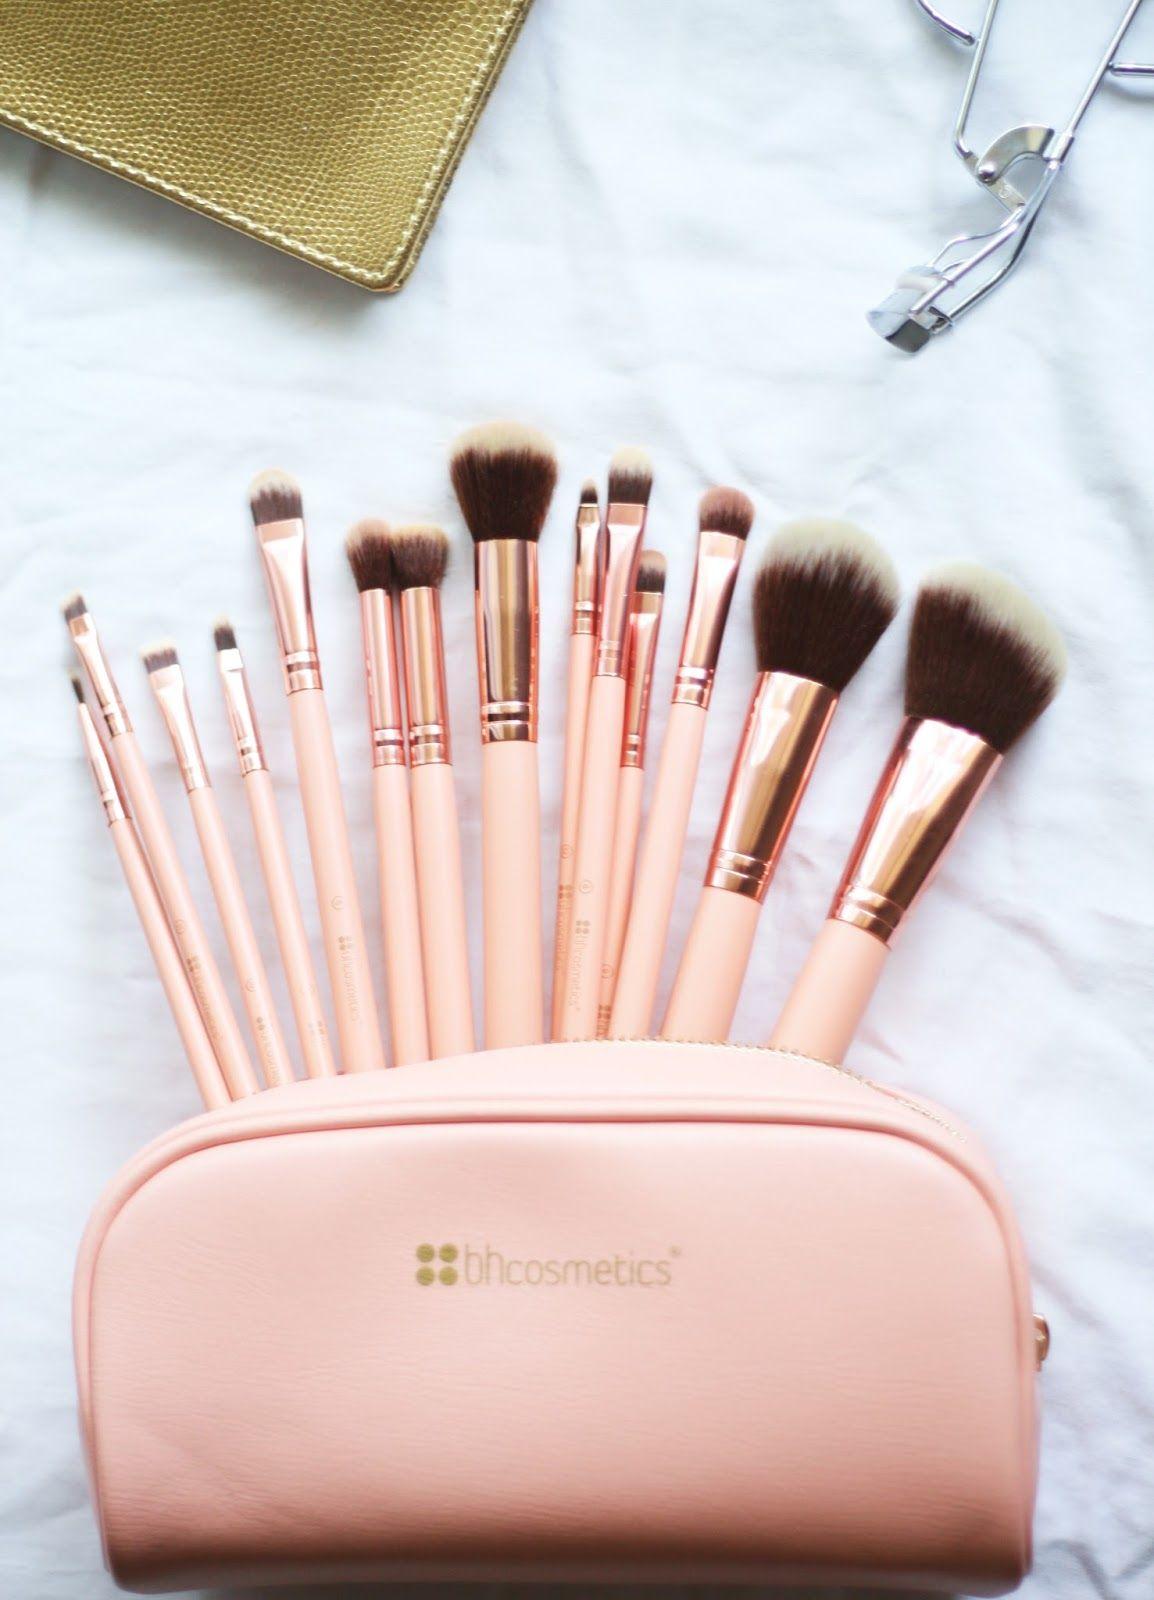 BH Cosmetics brush set Best eye makeup brushes, Bh